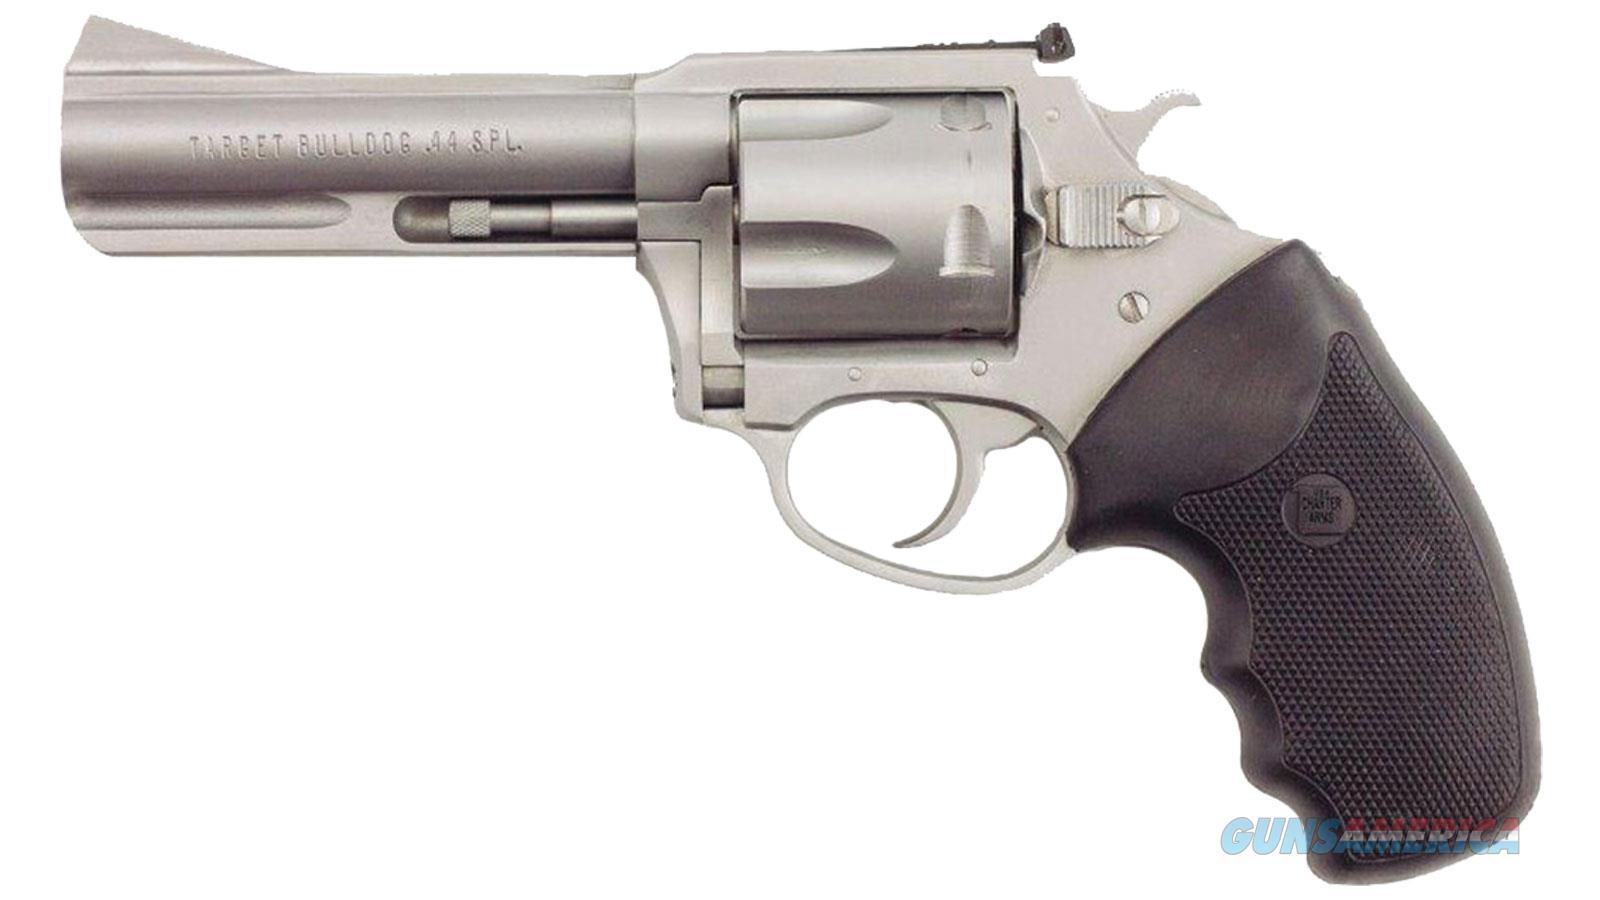 "Charter Arms Target Bulldog 44Spl 4.2"" 74442  Guns > Pistols > C Misc Pistols"